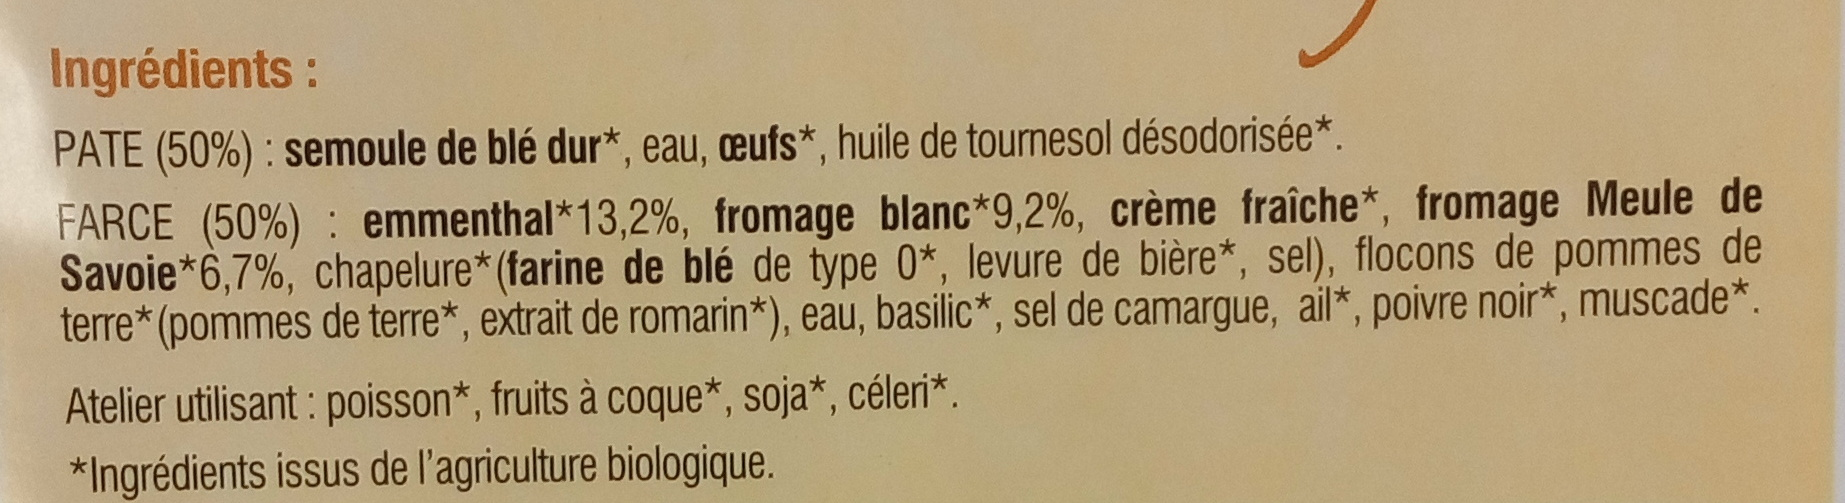 Ravioles aux 3 Fromages Bio - Ingredients - fr